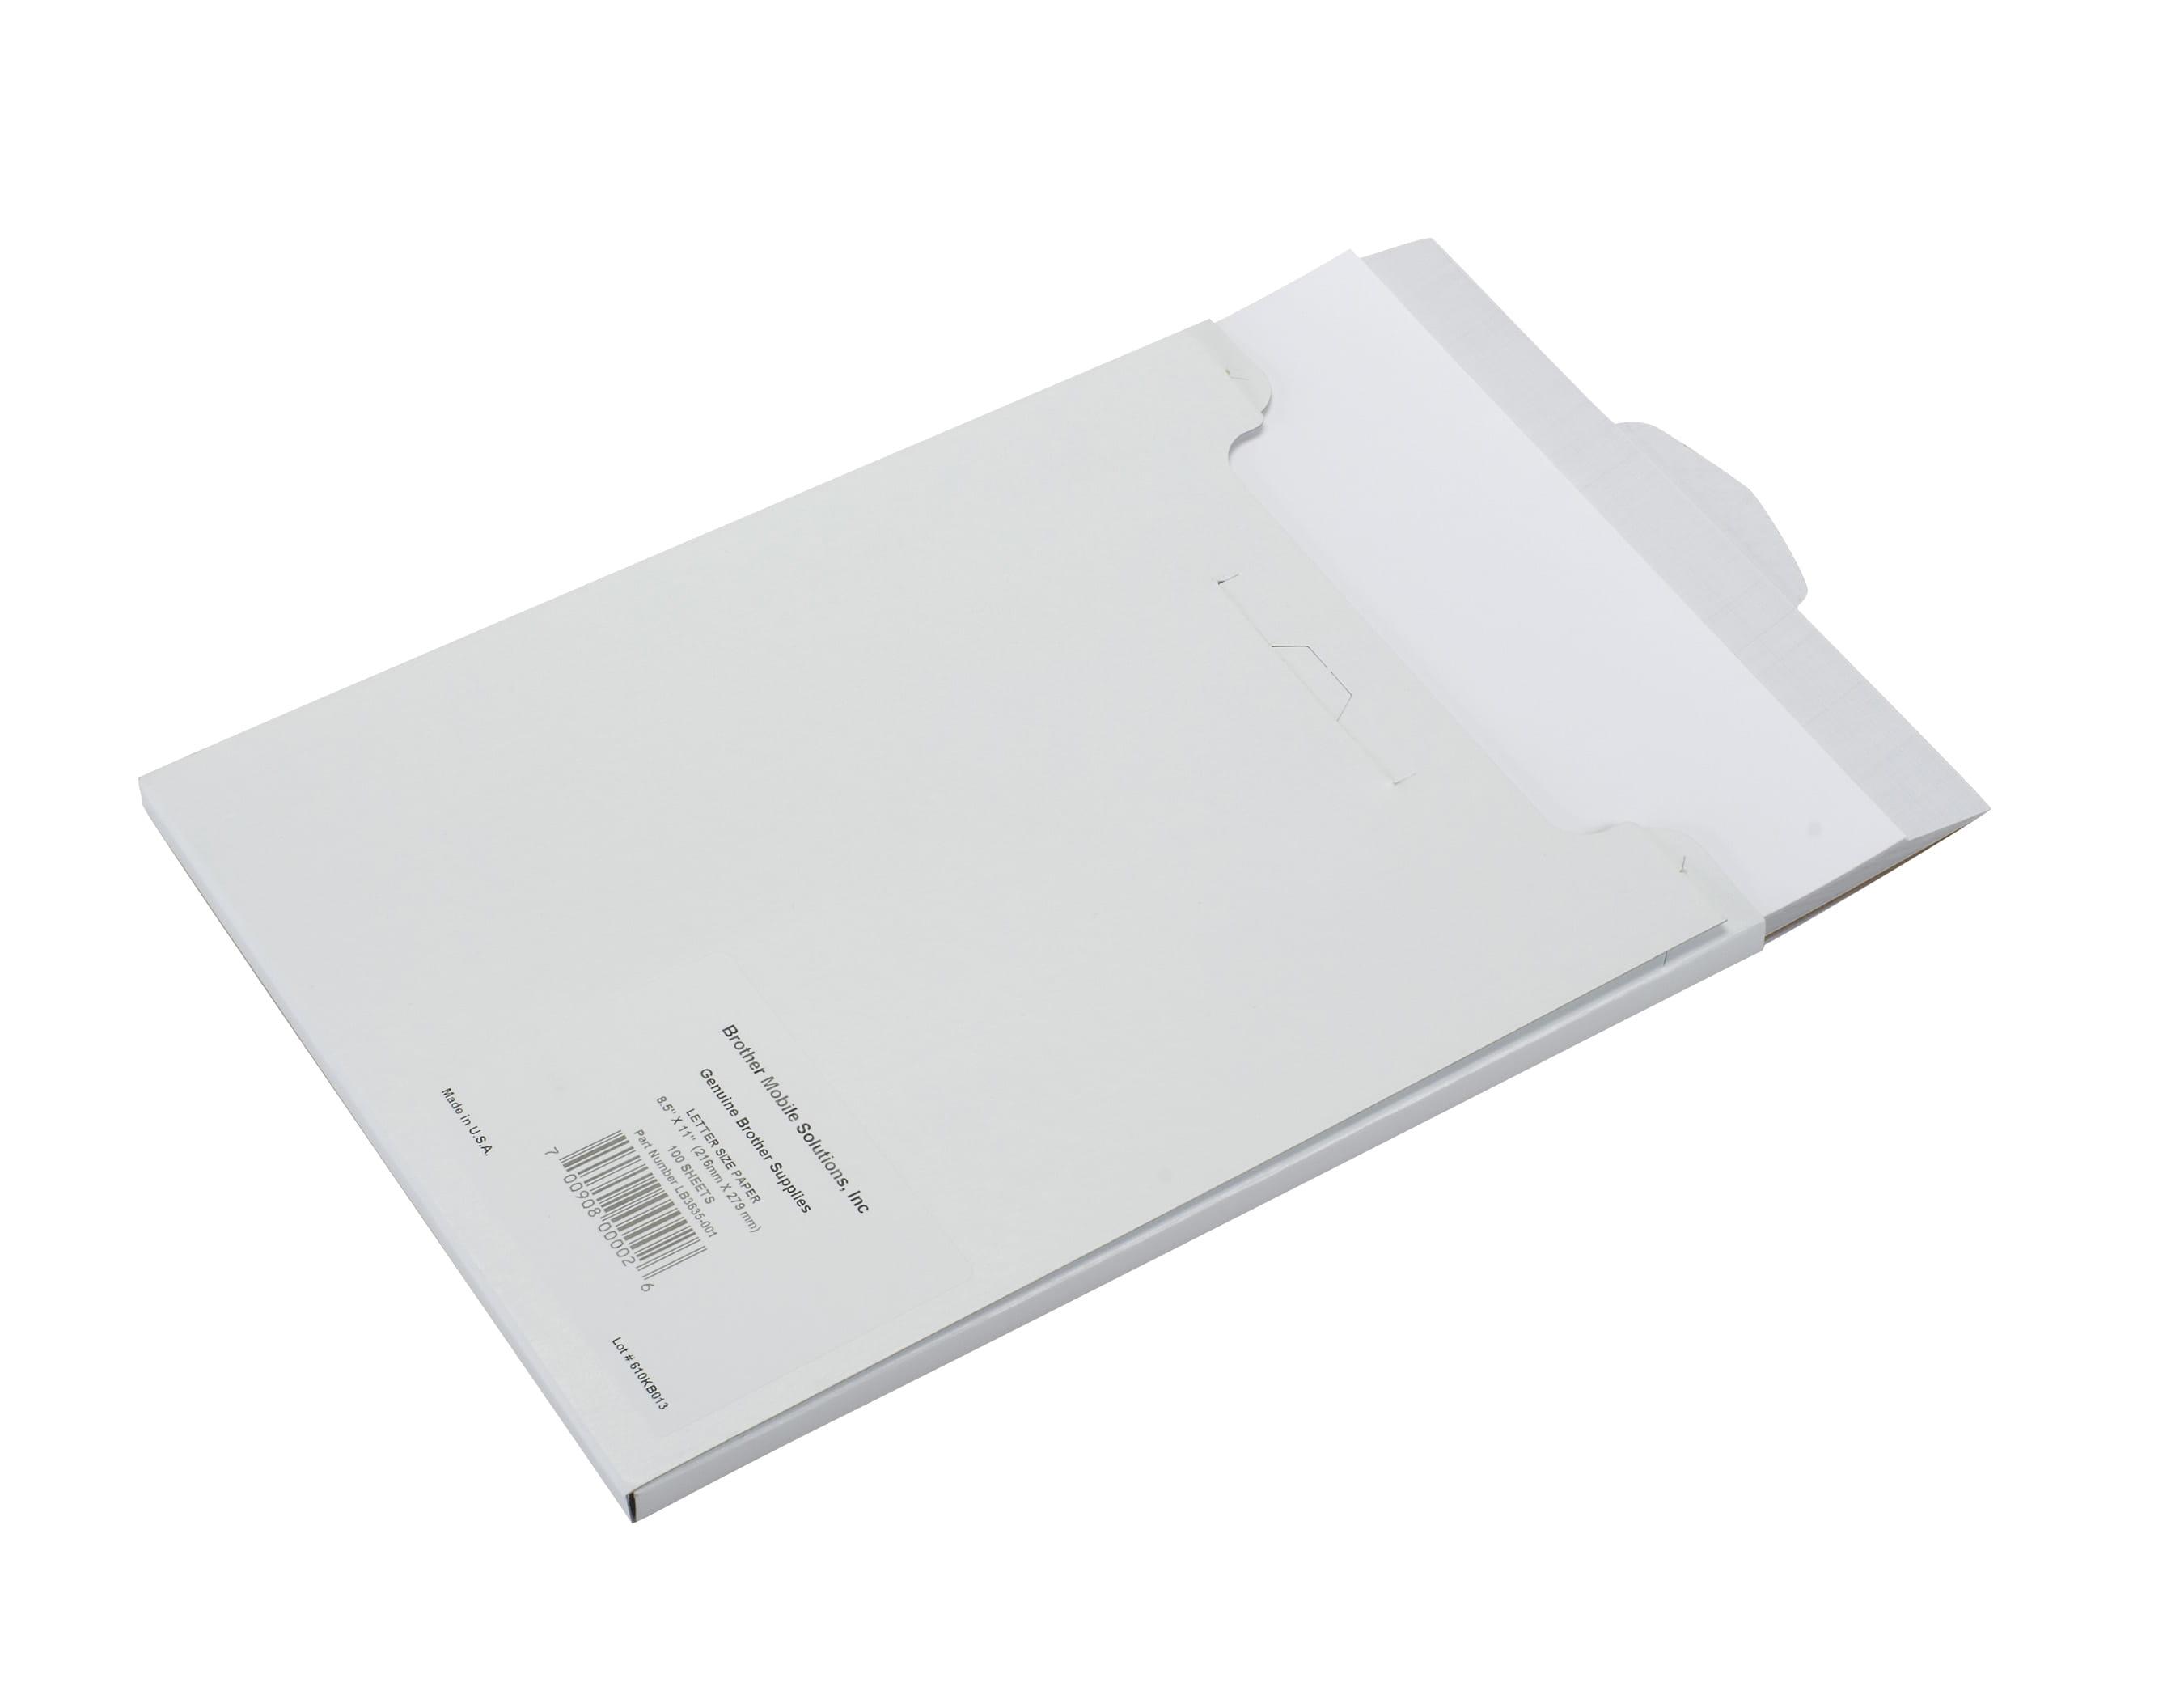 LB3635 - cut sheet